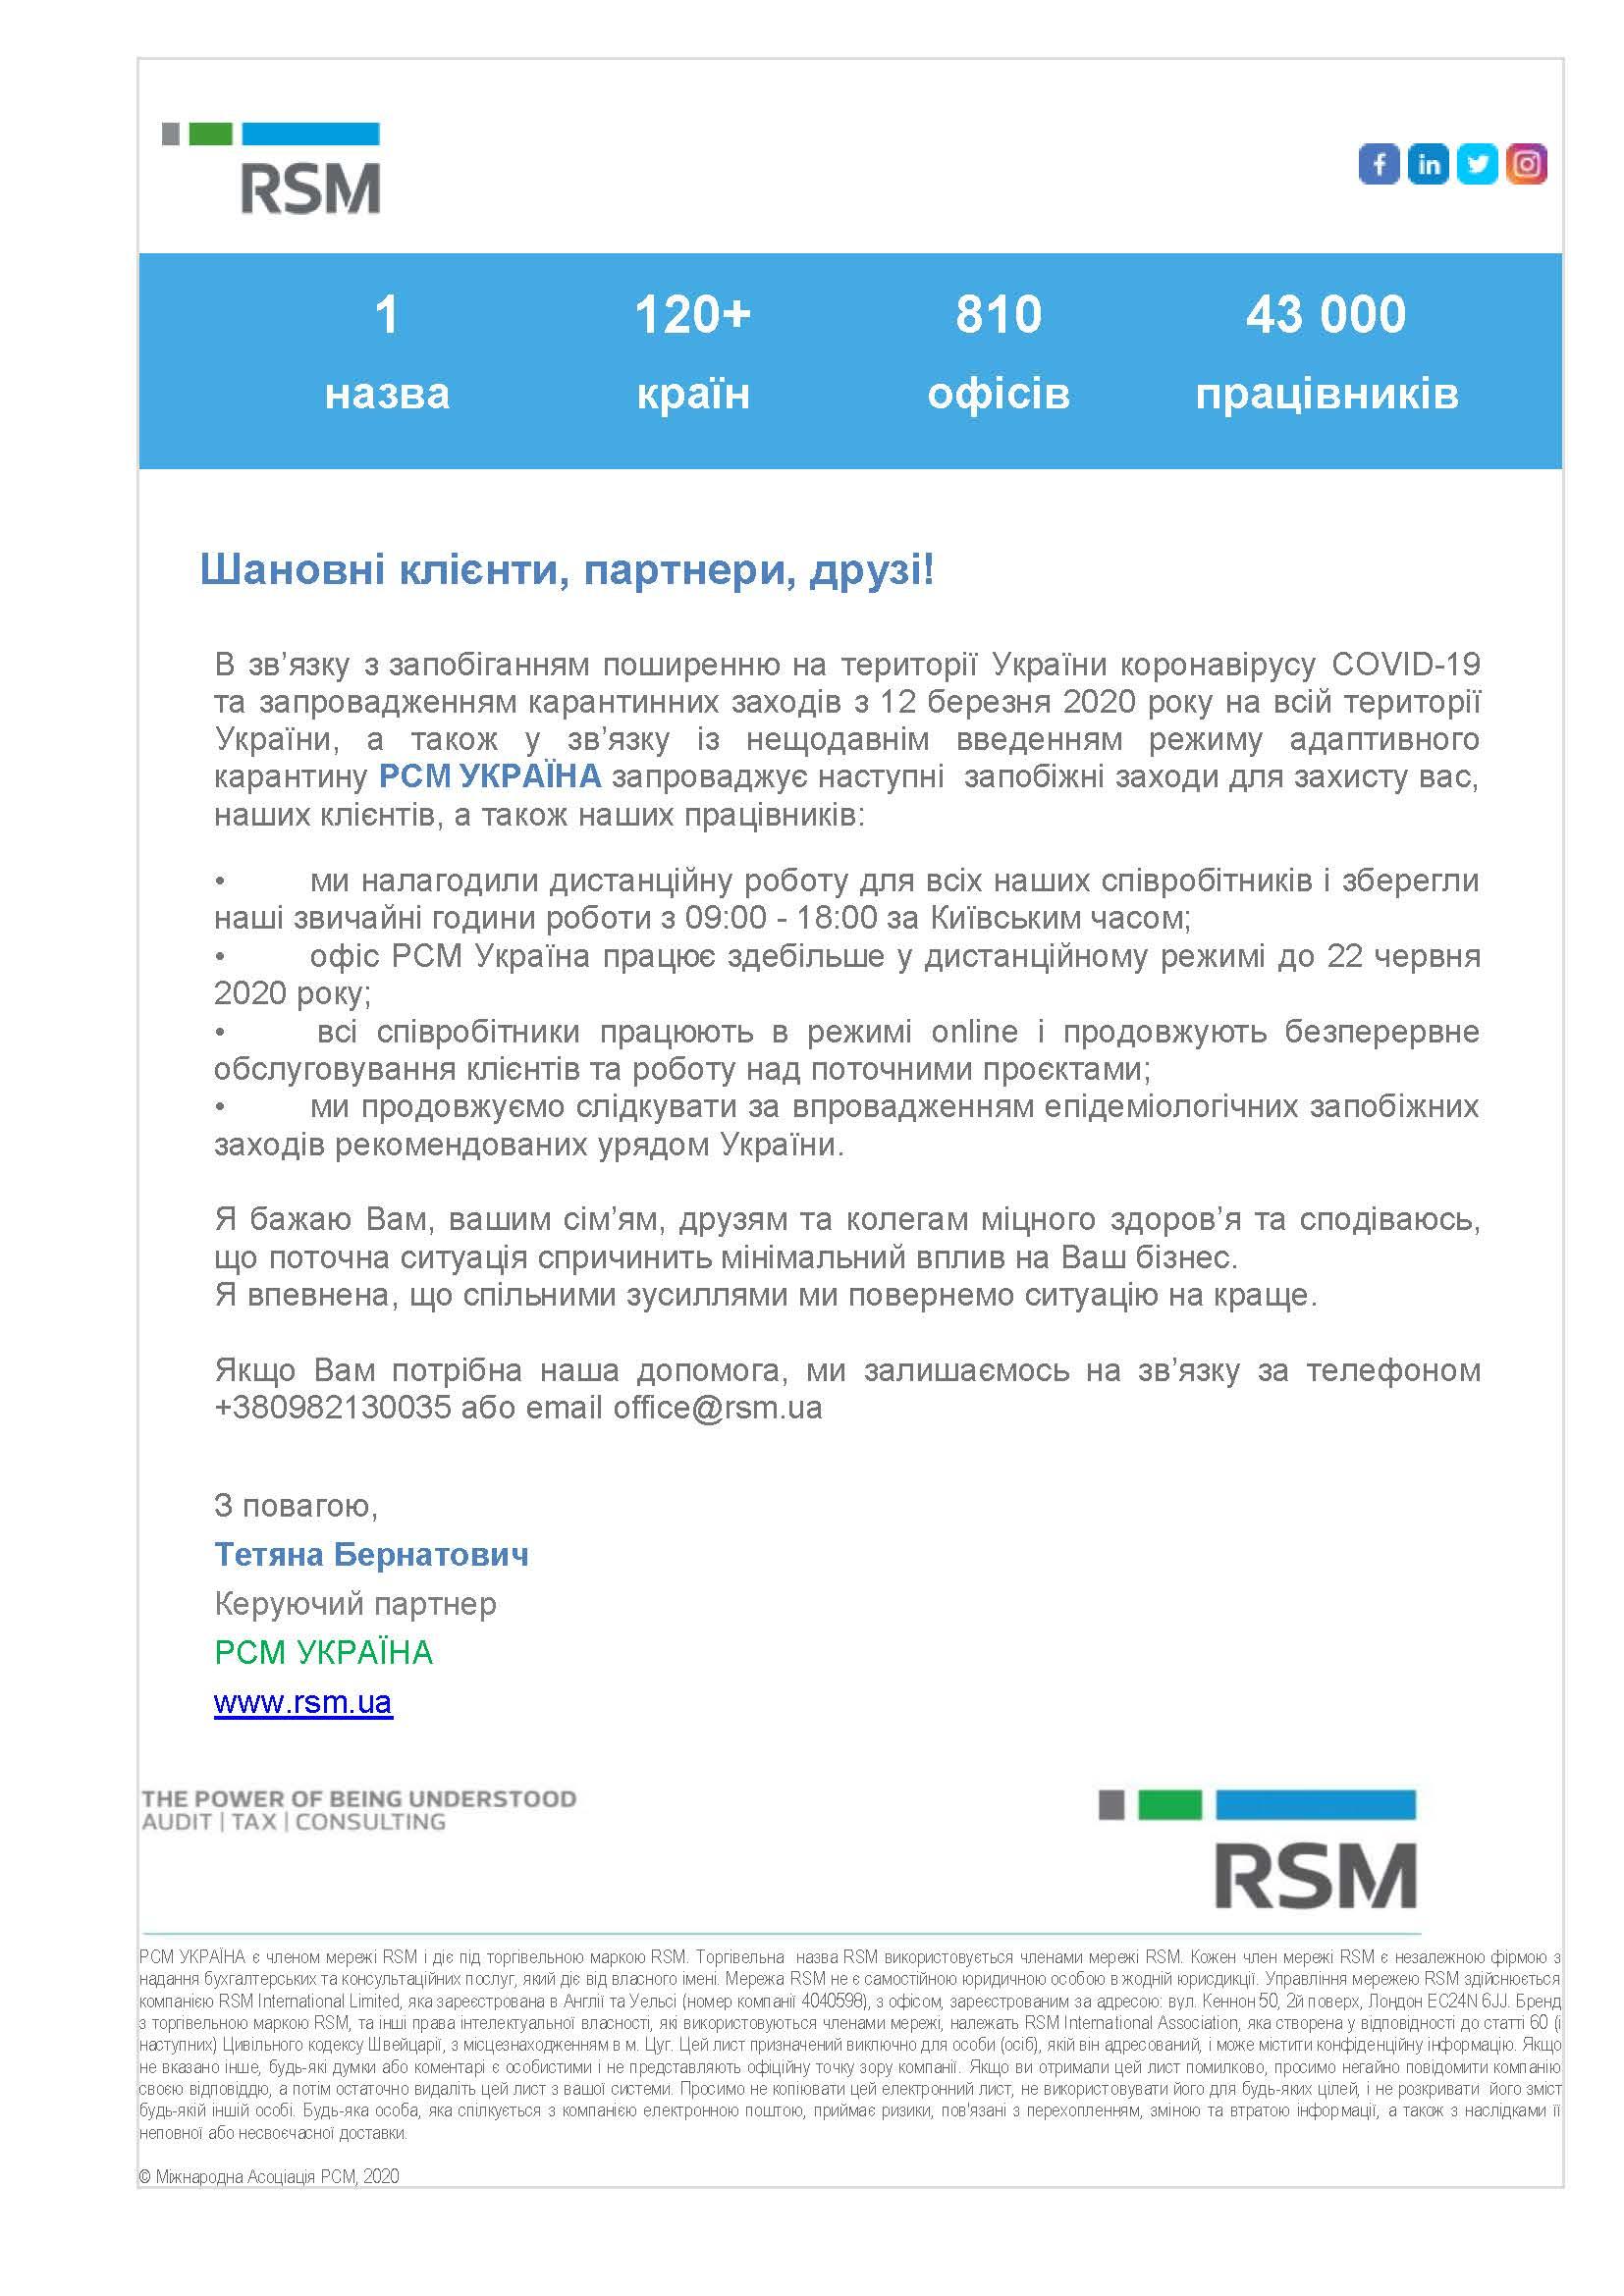 rsm_ukraine_announcements_ukr_nov.jpg